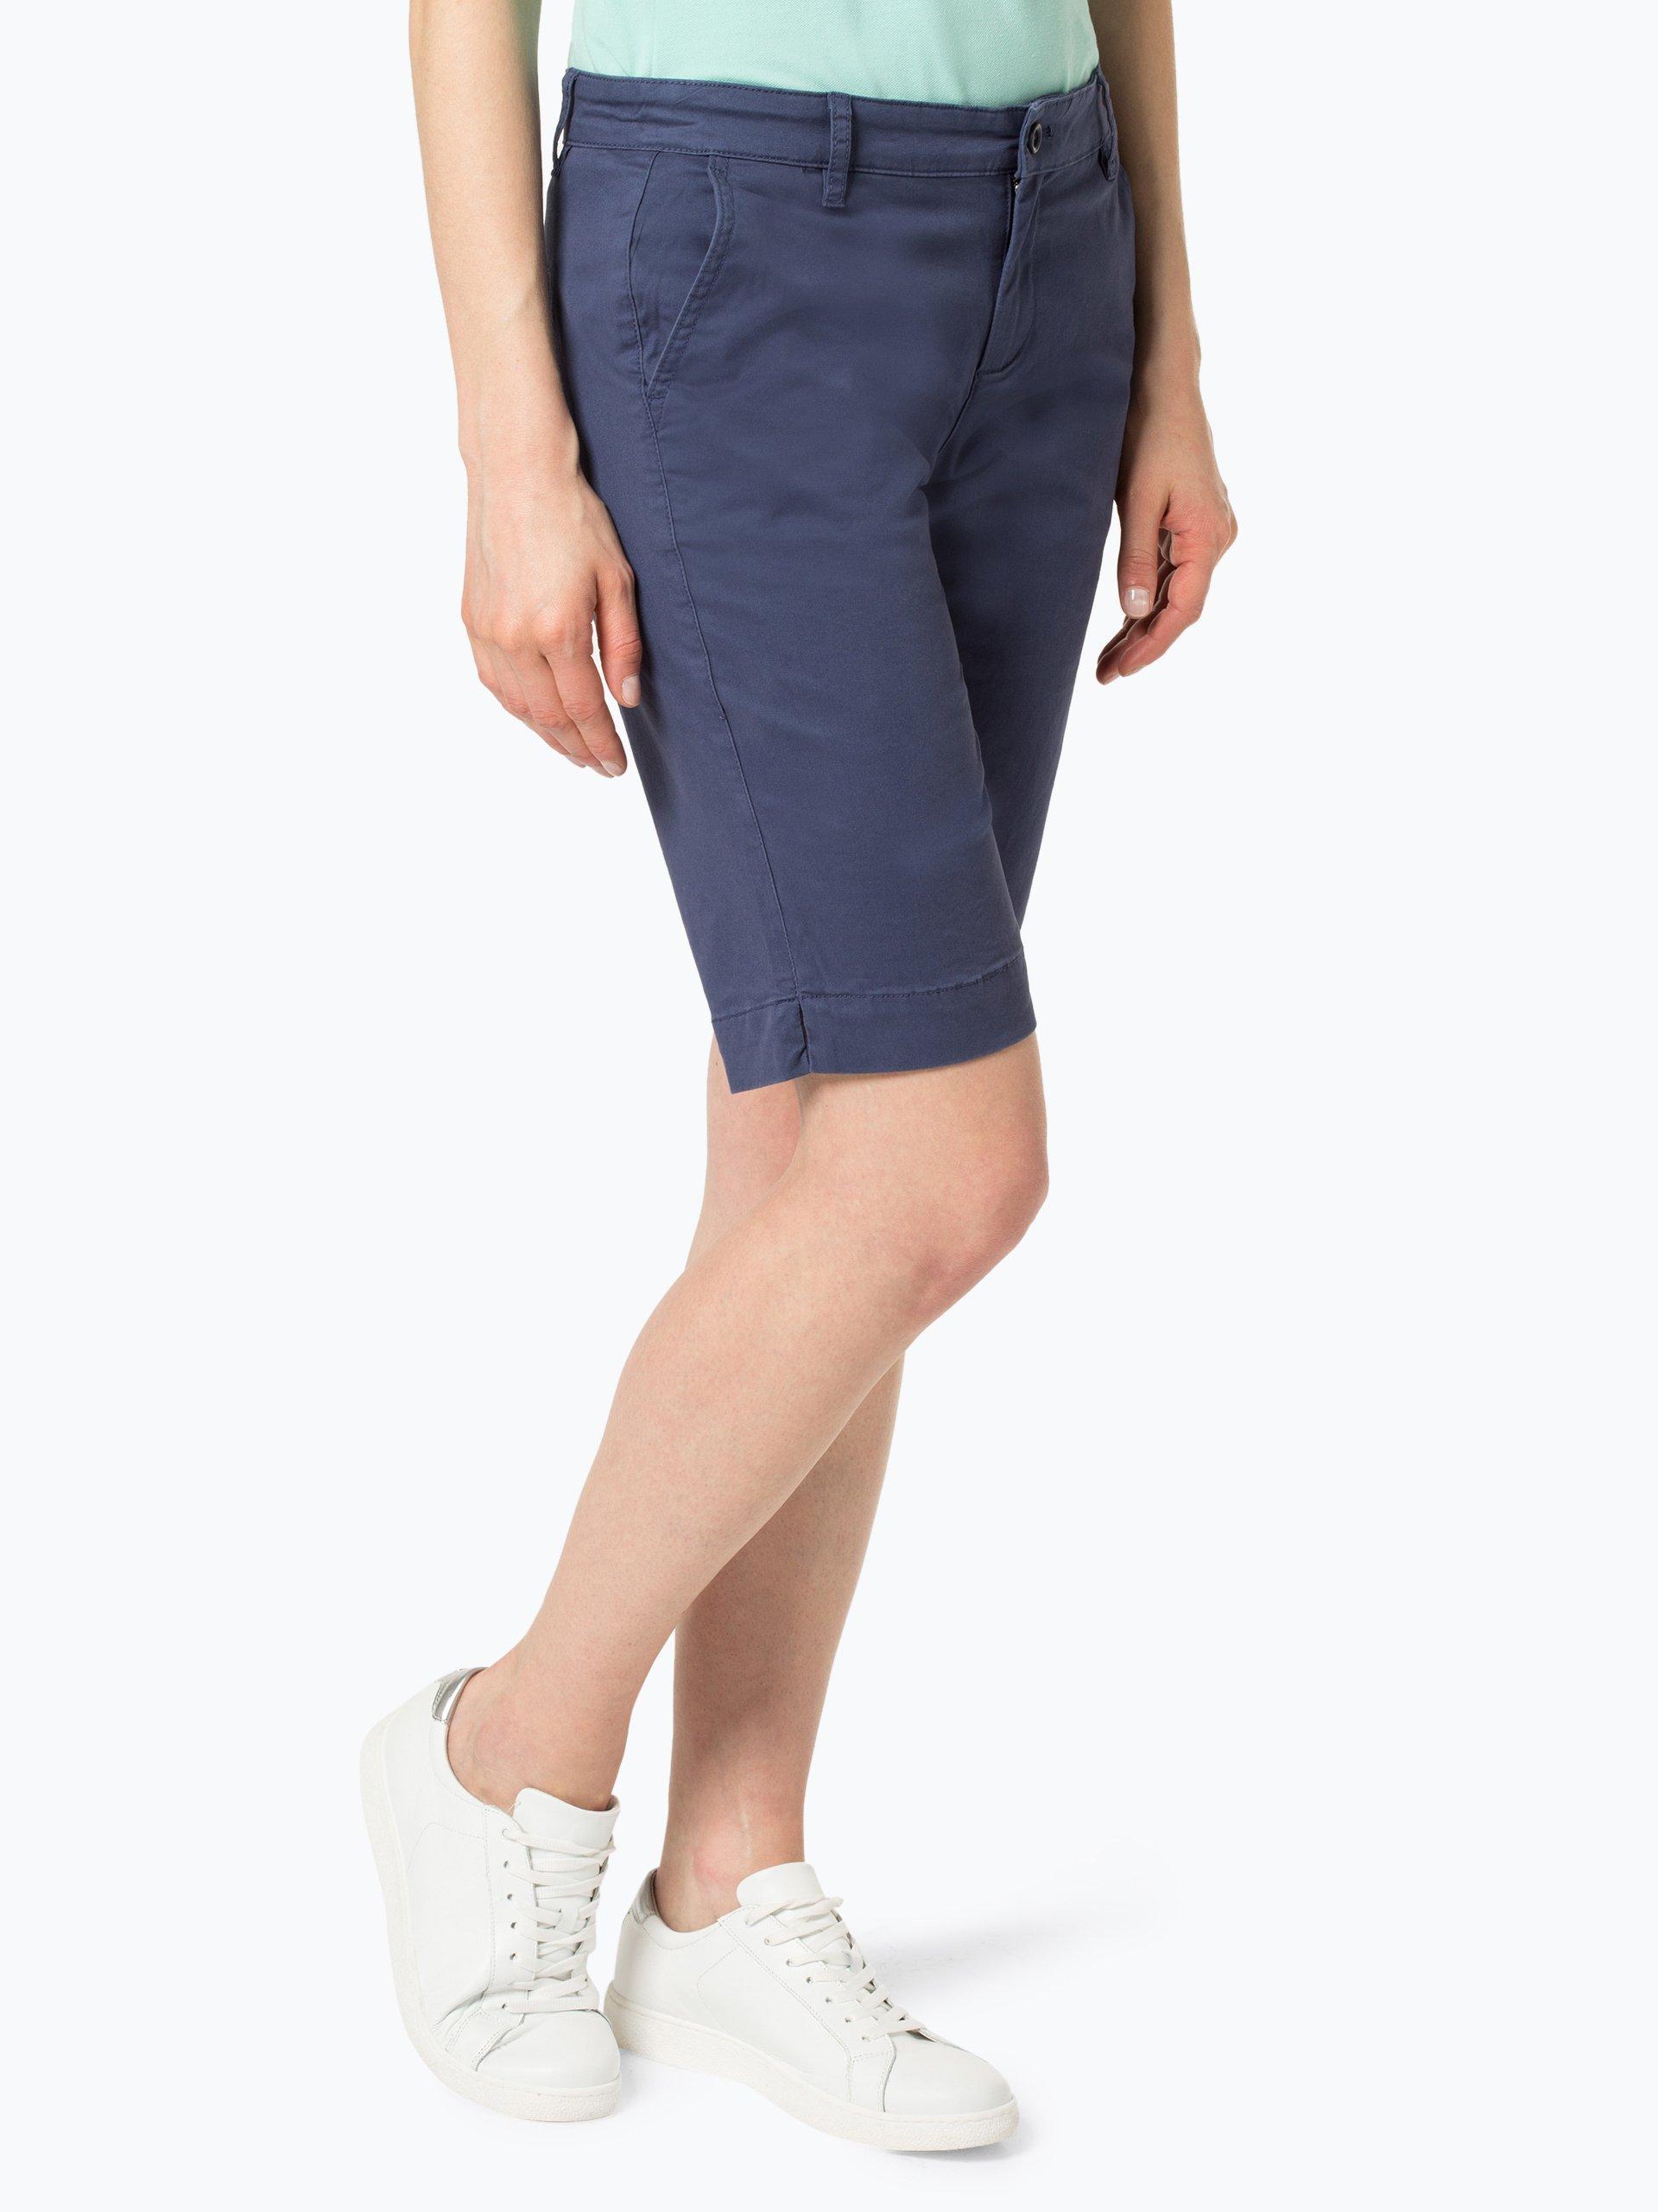 Franco Callegari Damen Shorts